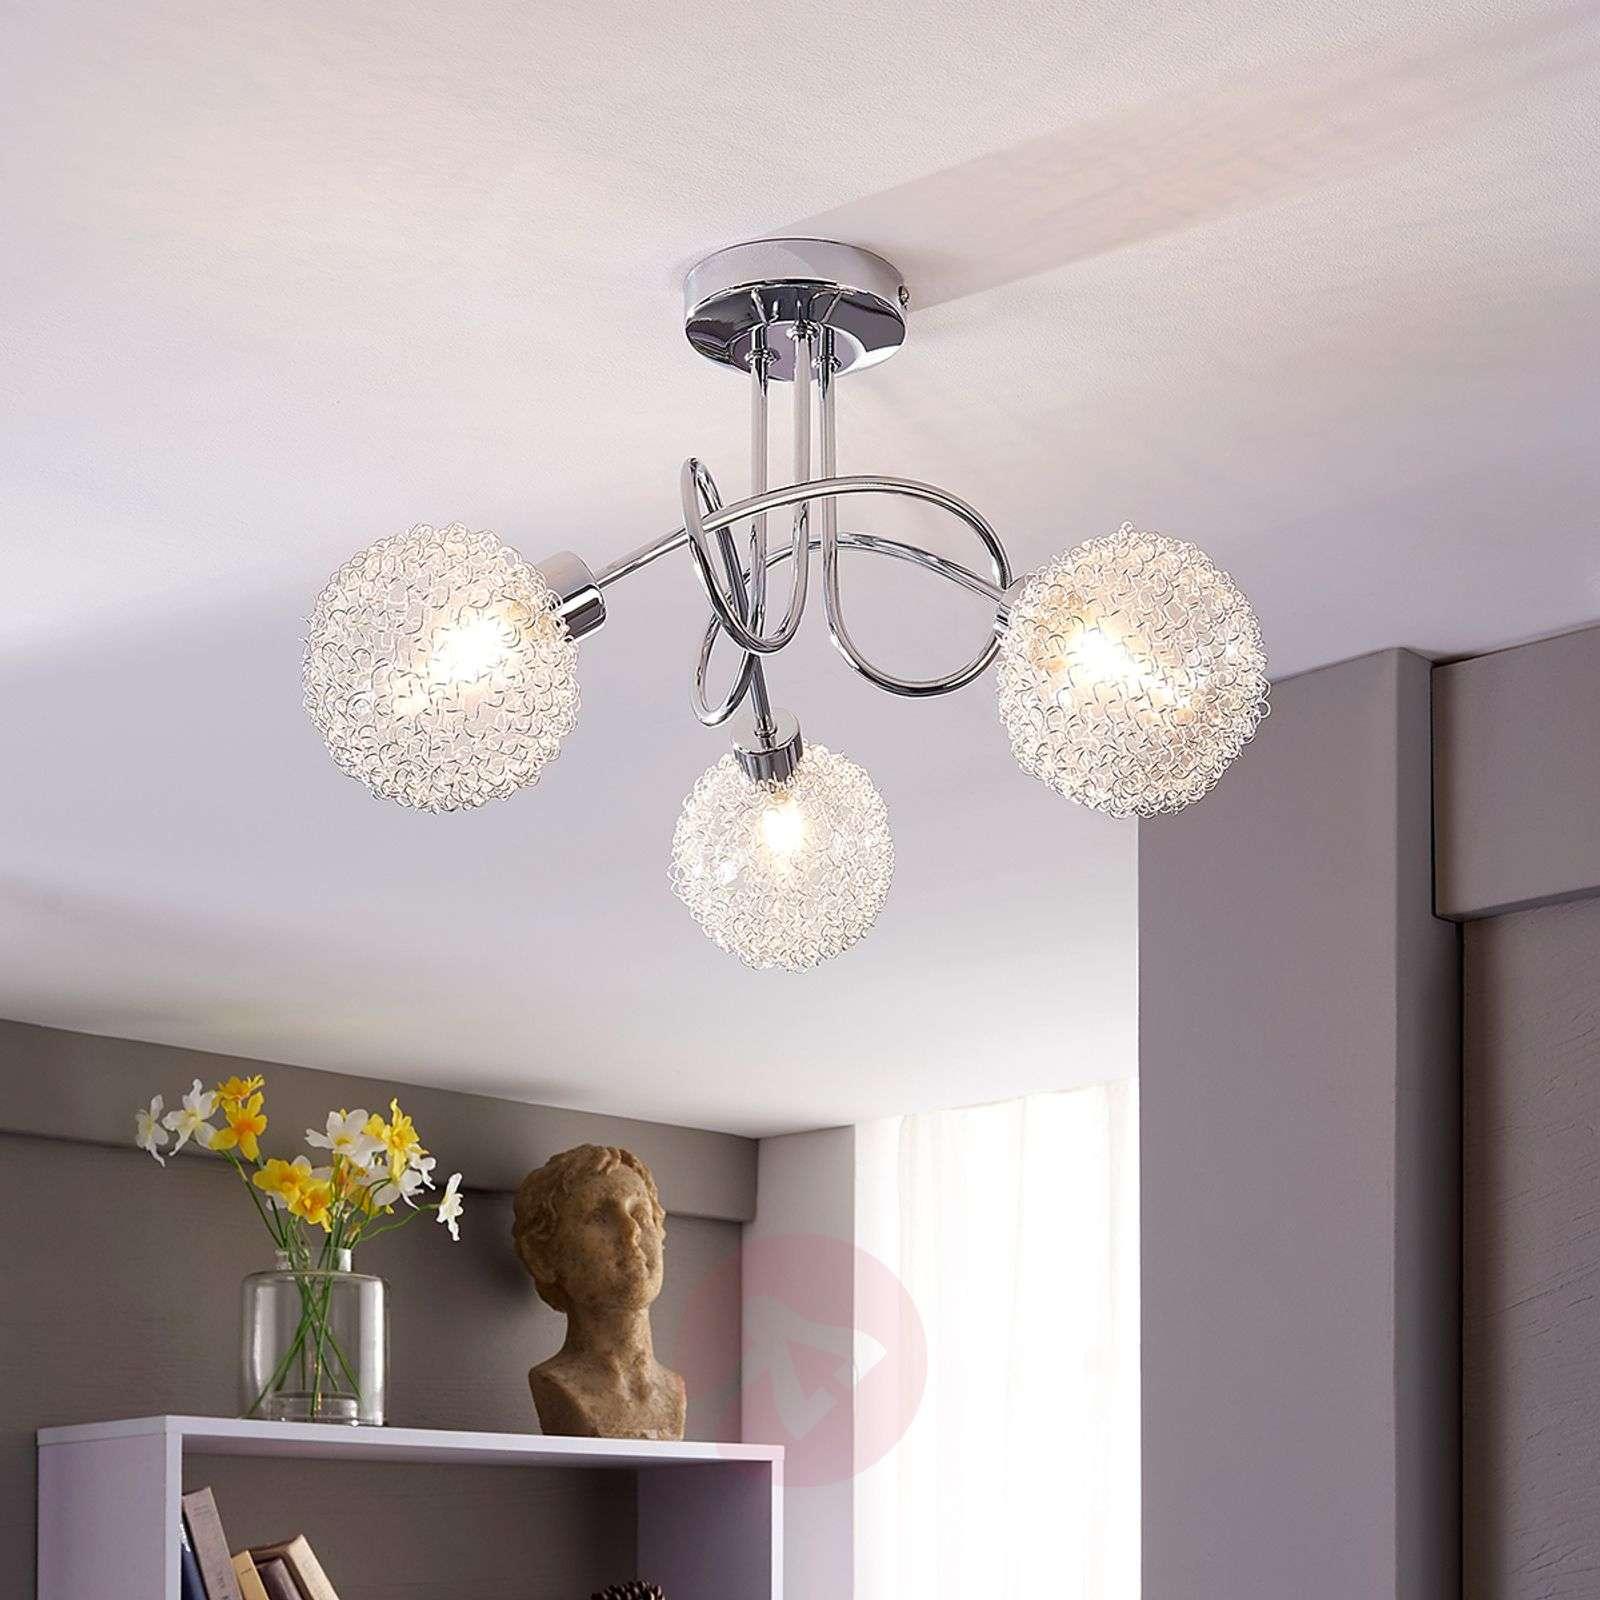 Ticino LED ceiling lamp, 3 bulbs-9620780-01